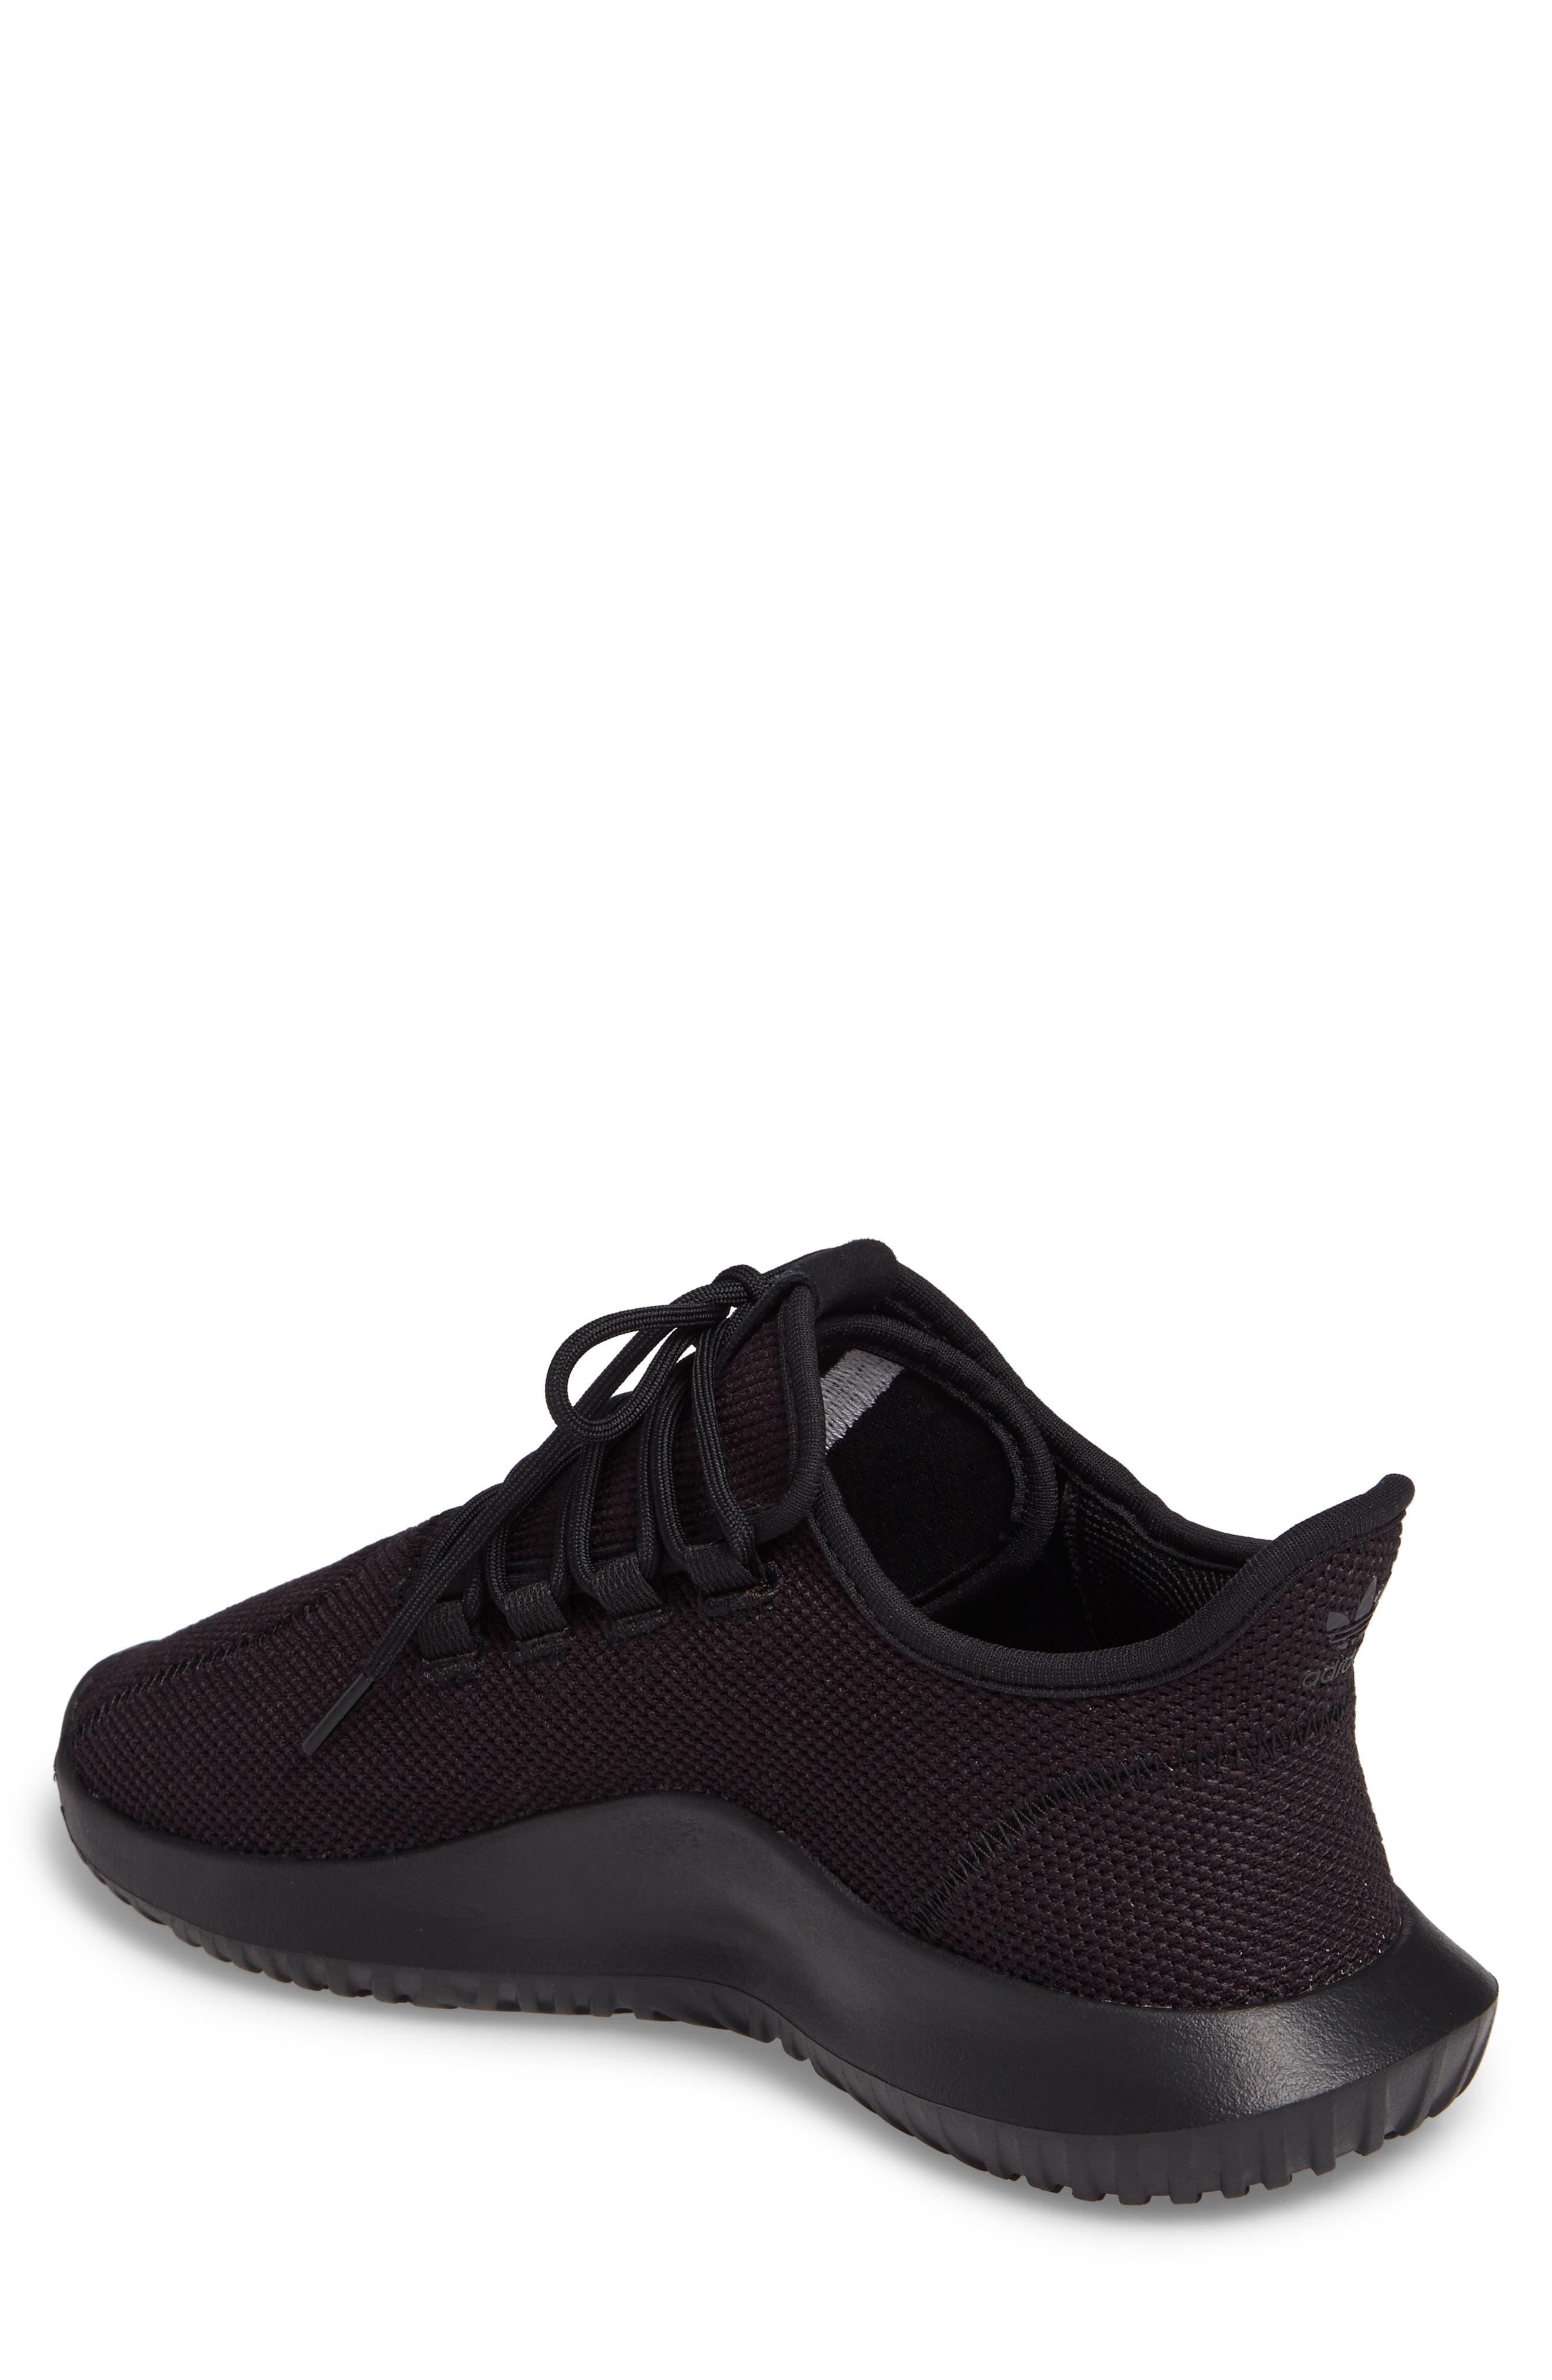 Tubular Shadow Sneaker,                             Alternate thumbnail 8, color,